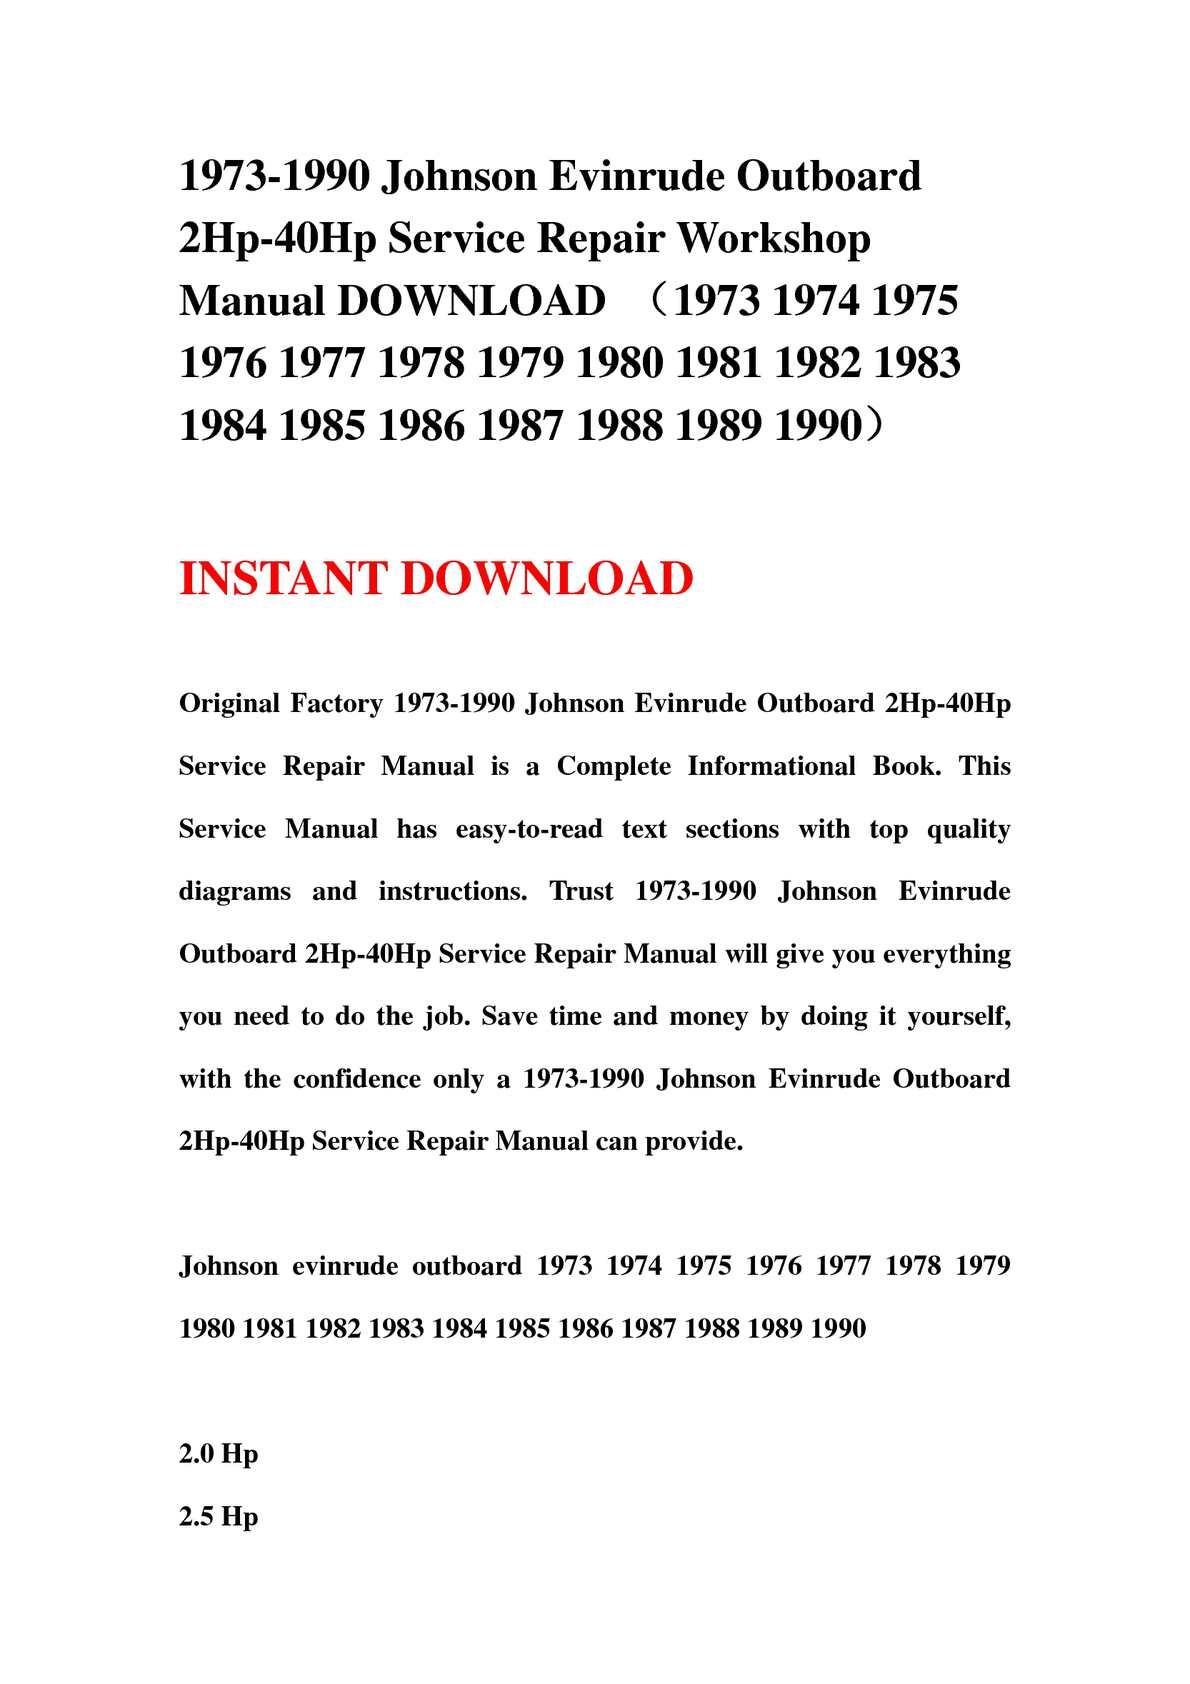 Calaméo - 1973-1990 Johnson Evinrude Outboard 2Hp-40Hp Service Repair  Workshop Manual DOWNLOAD (1973 1974 1975 1976 1977 1978 1979 1980 1981 1982  1983 1984 ...